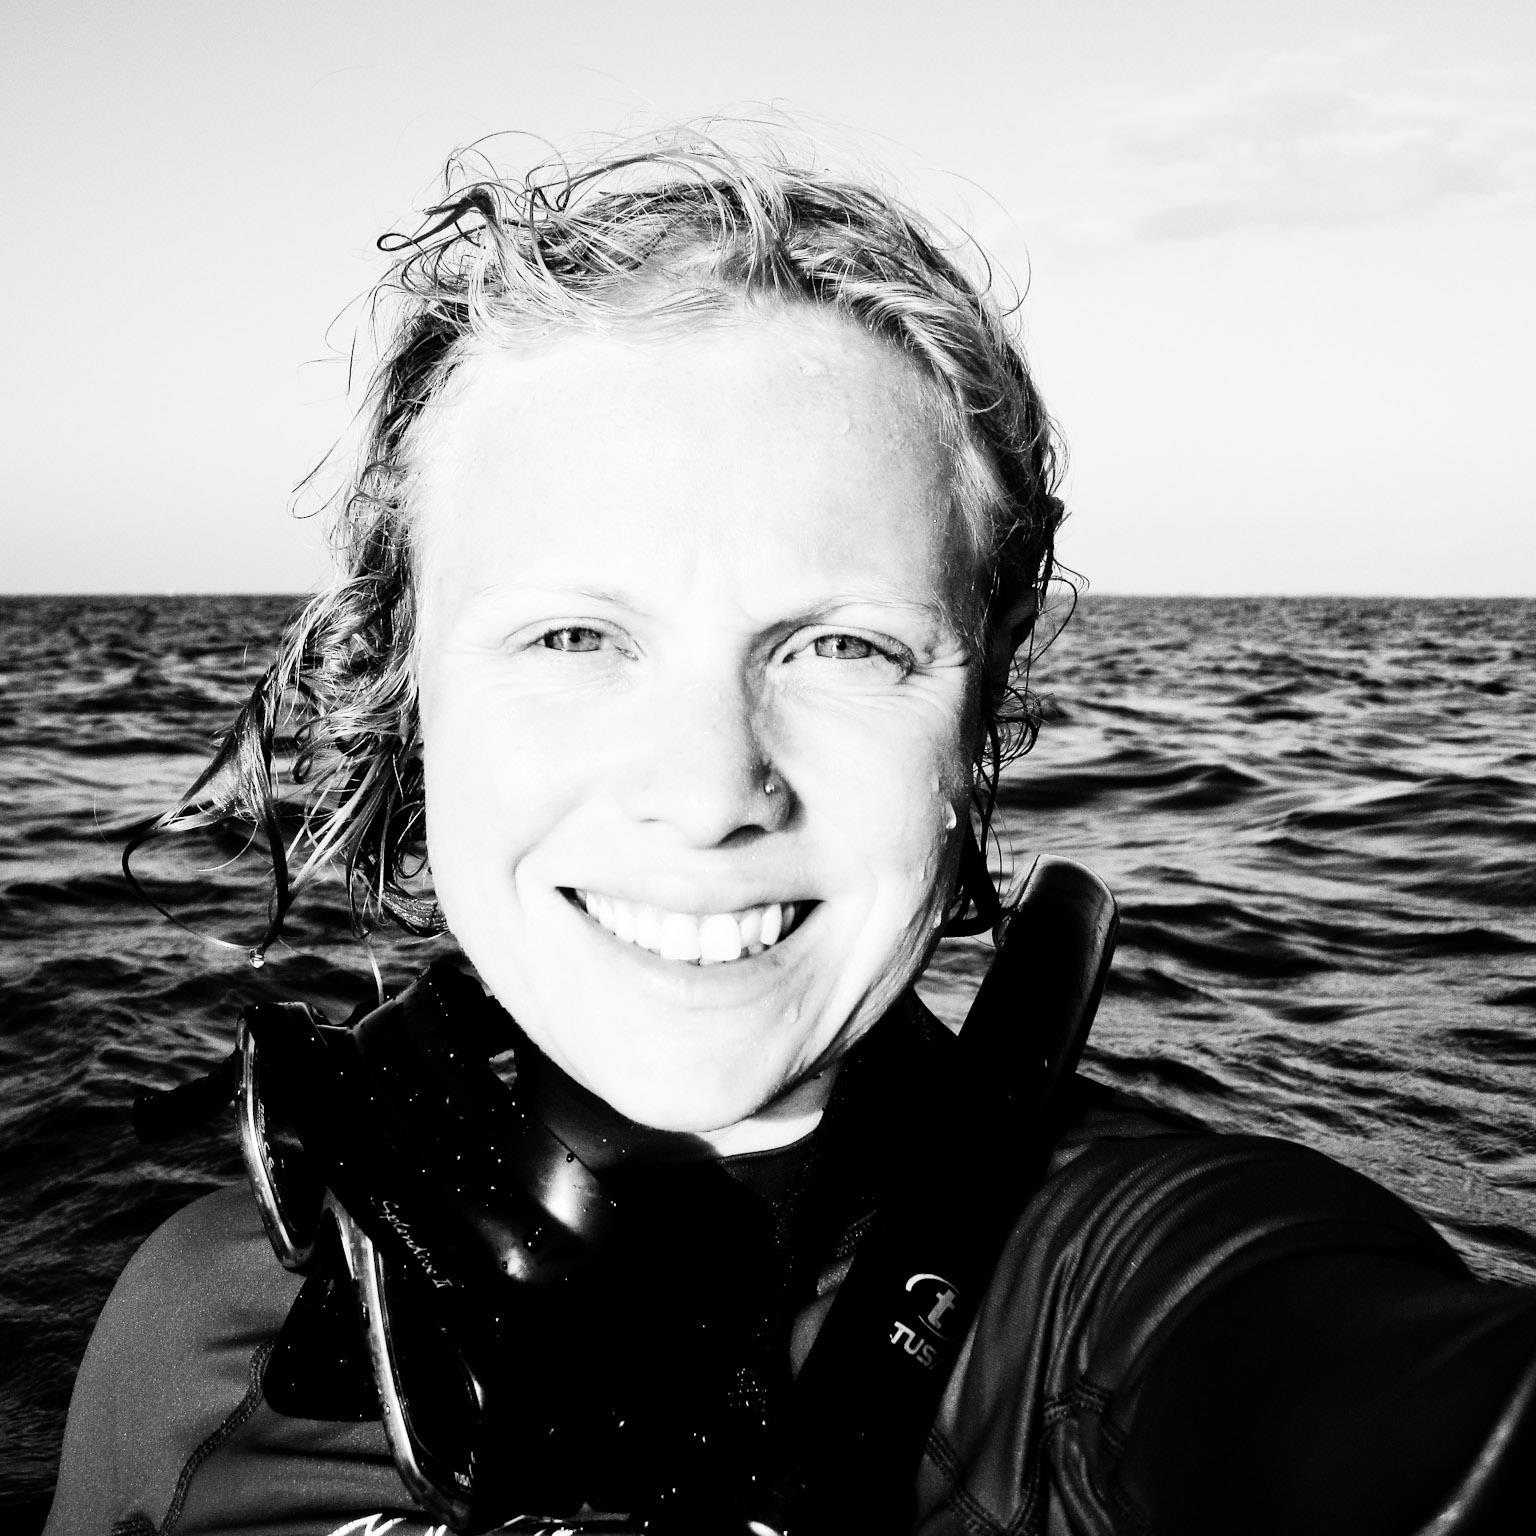 Em_bw snorkel.jpg